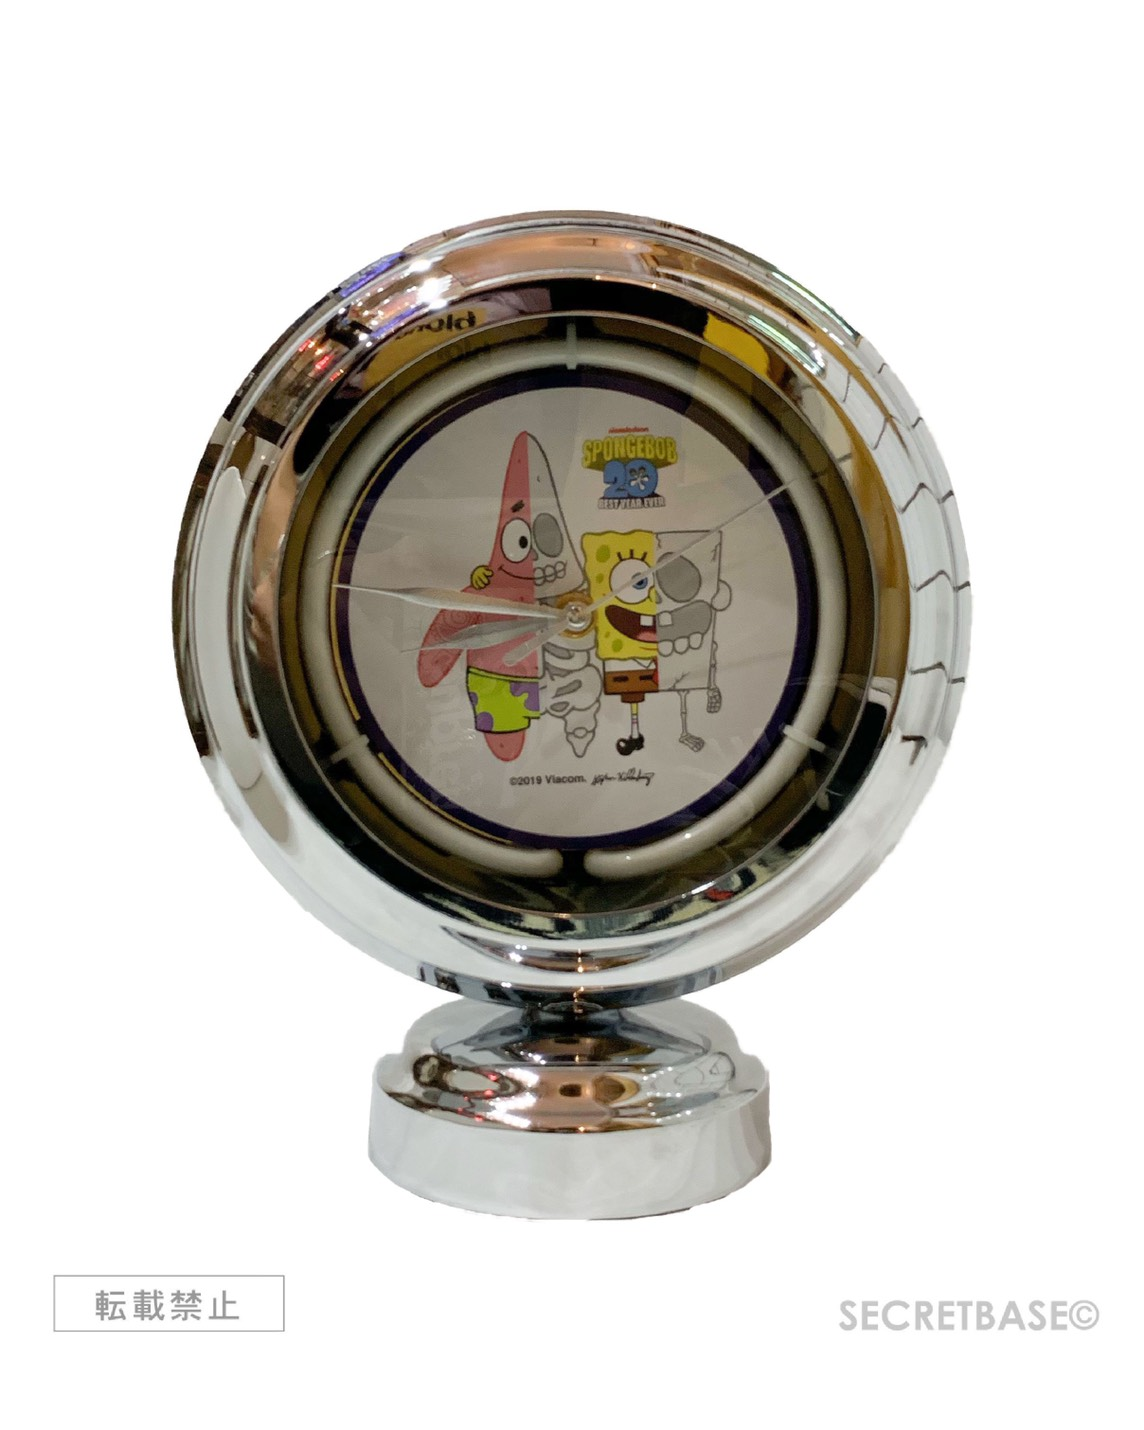 画像1: SECRETBASE ORIGINAL X-RAY SPONGEBOB & PATRICK NEON CLOCK (1)